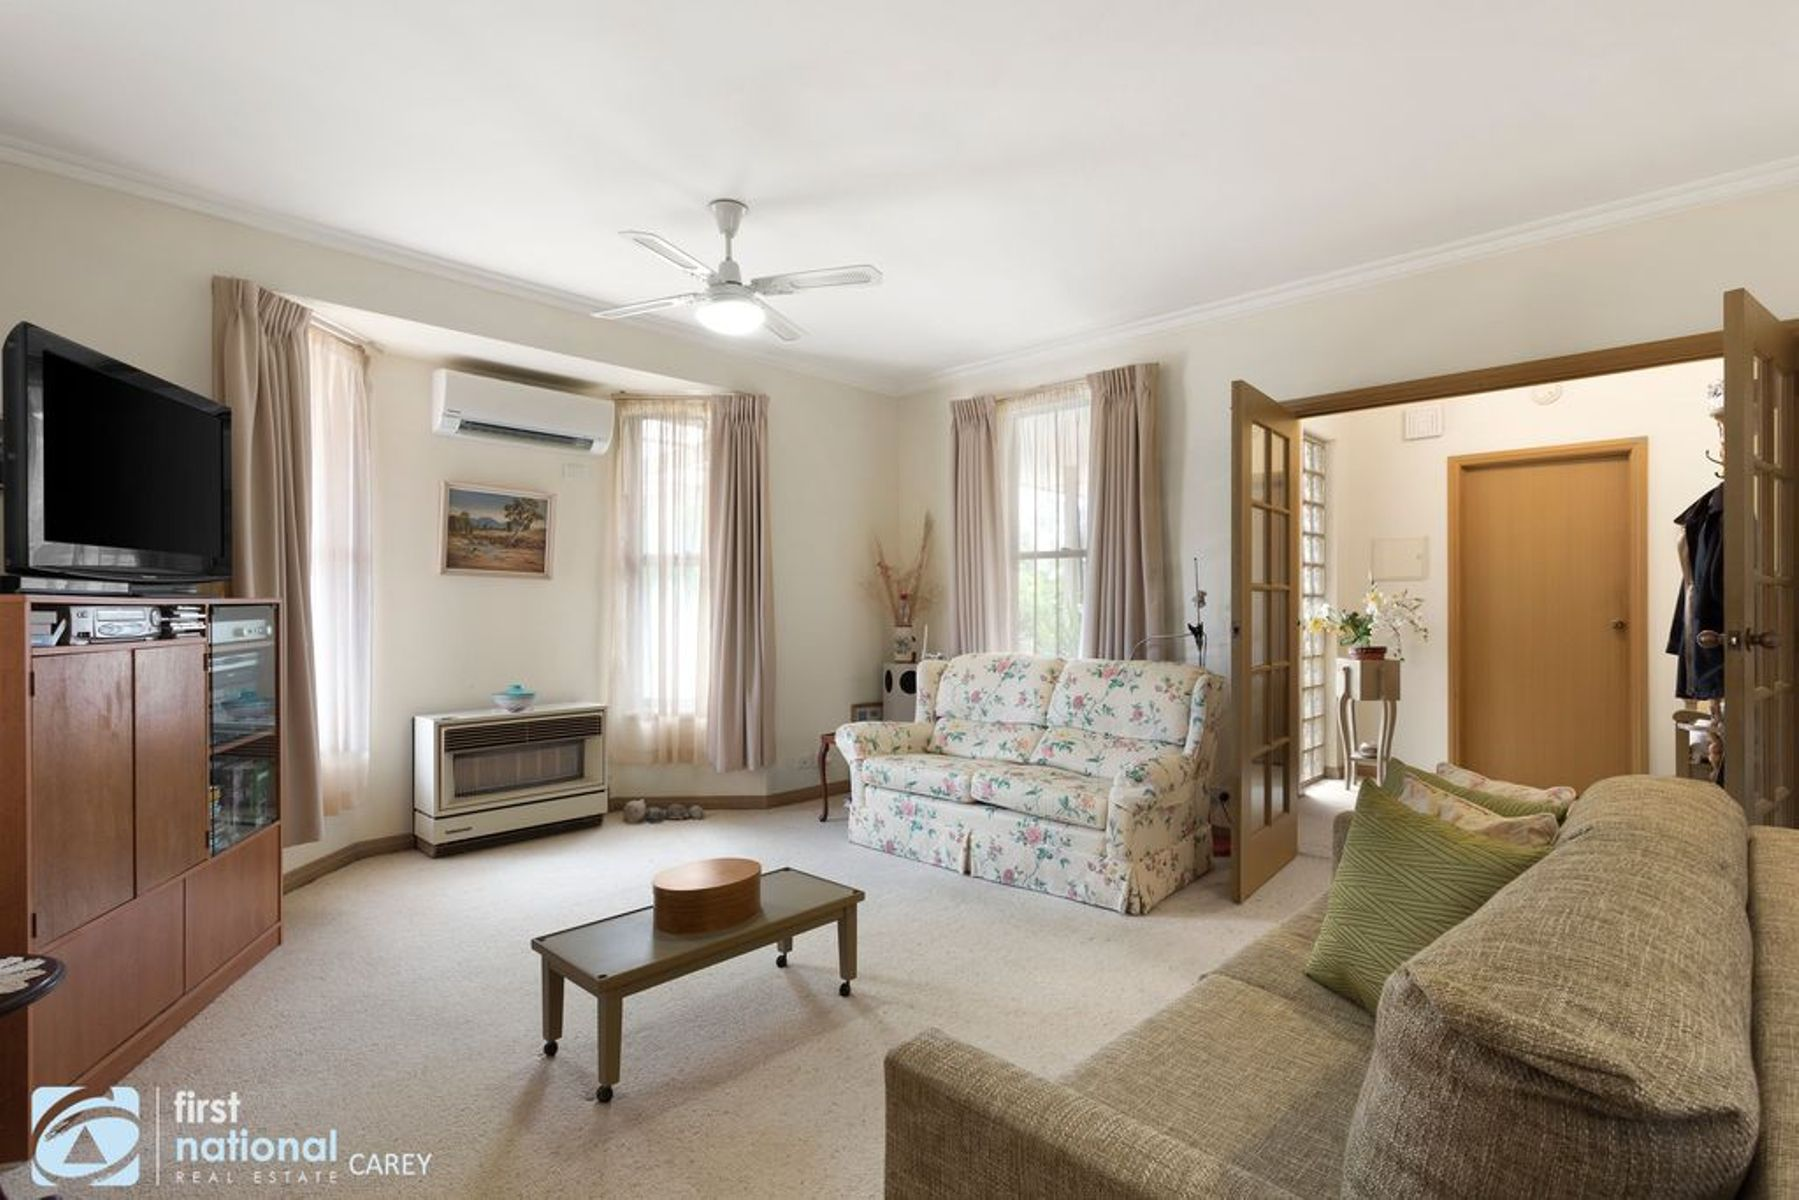 39 Flinders Ave Lara Vic 3212 Australia House For Sale